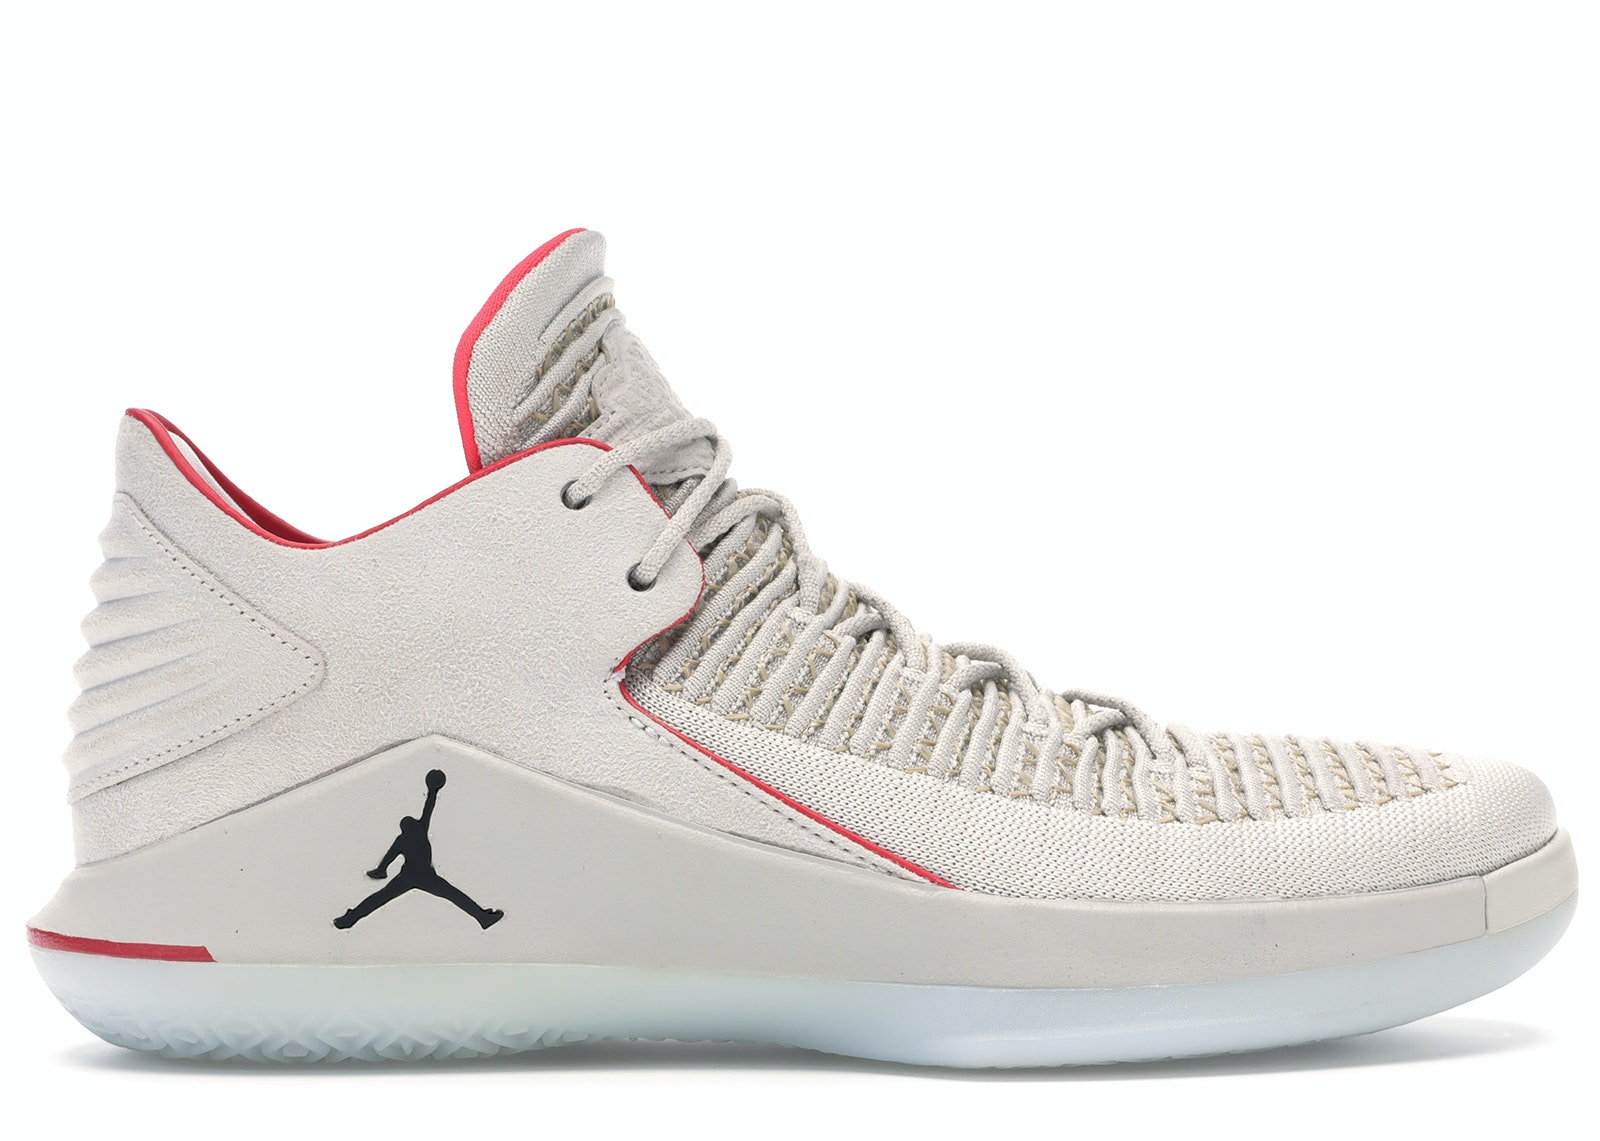 Jordan XXXII Low Gordon St.